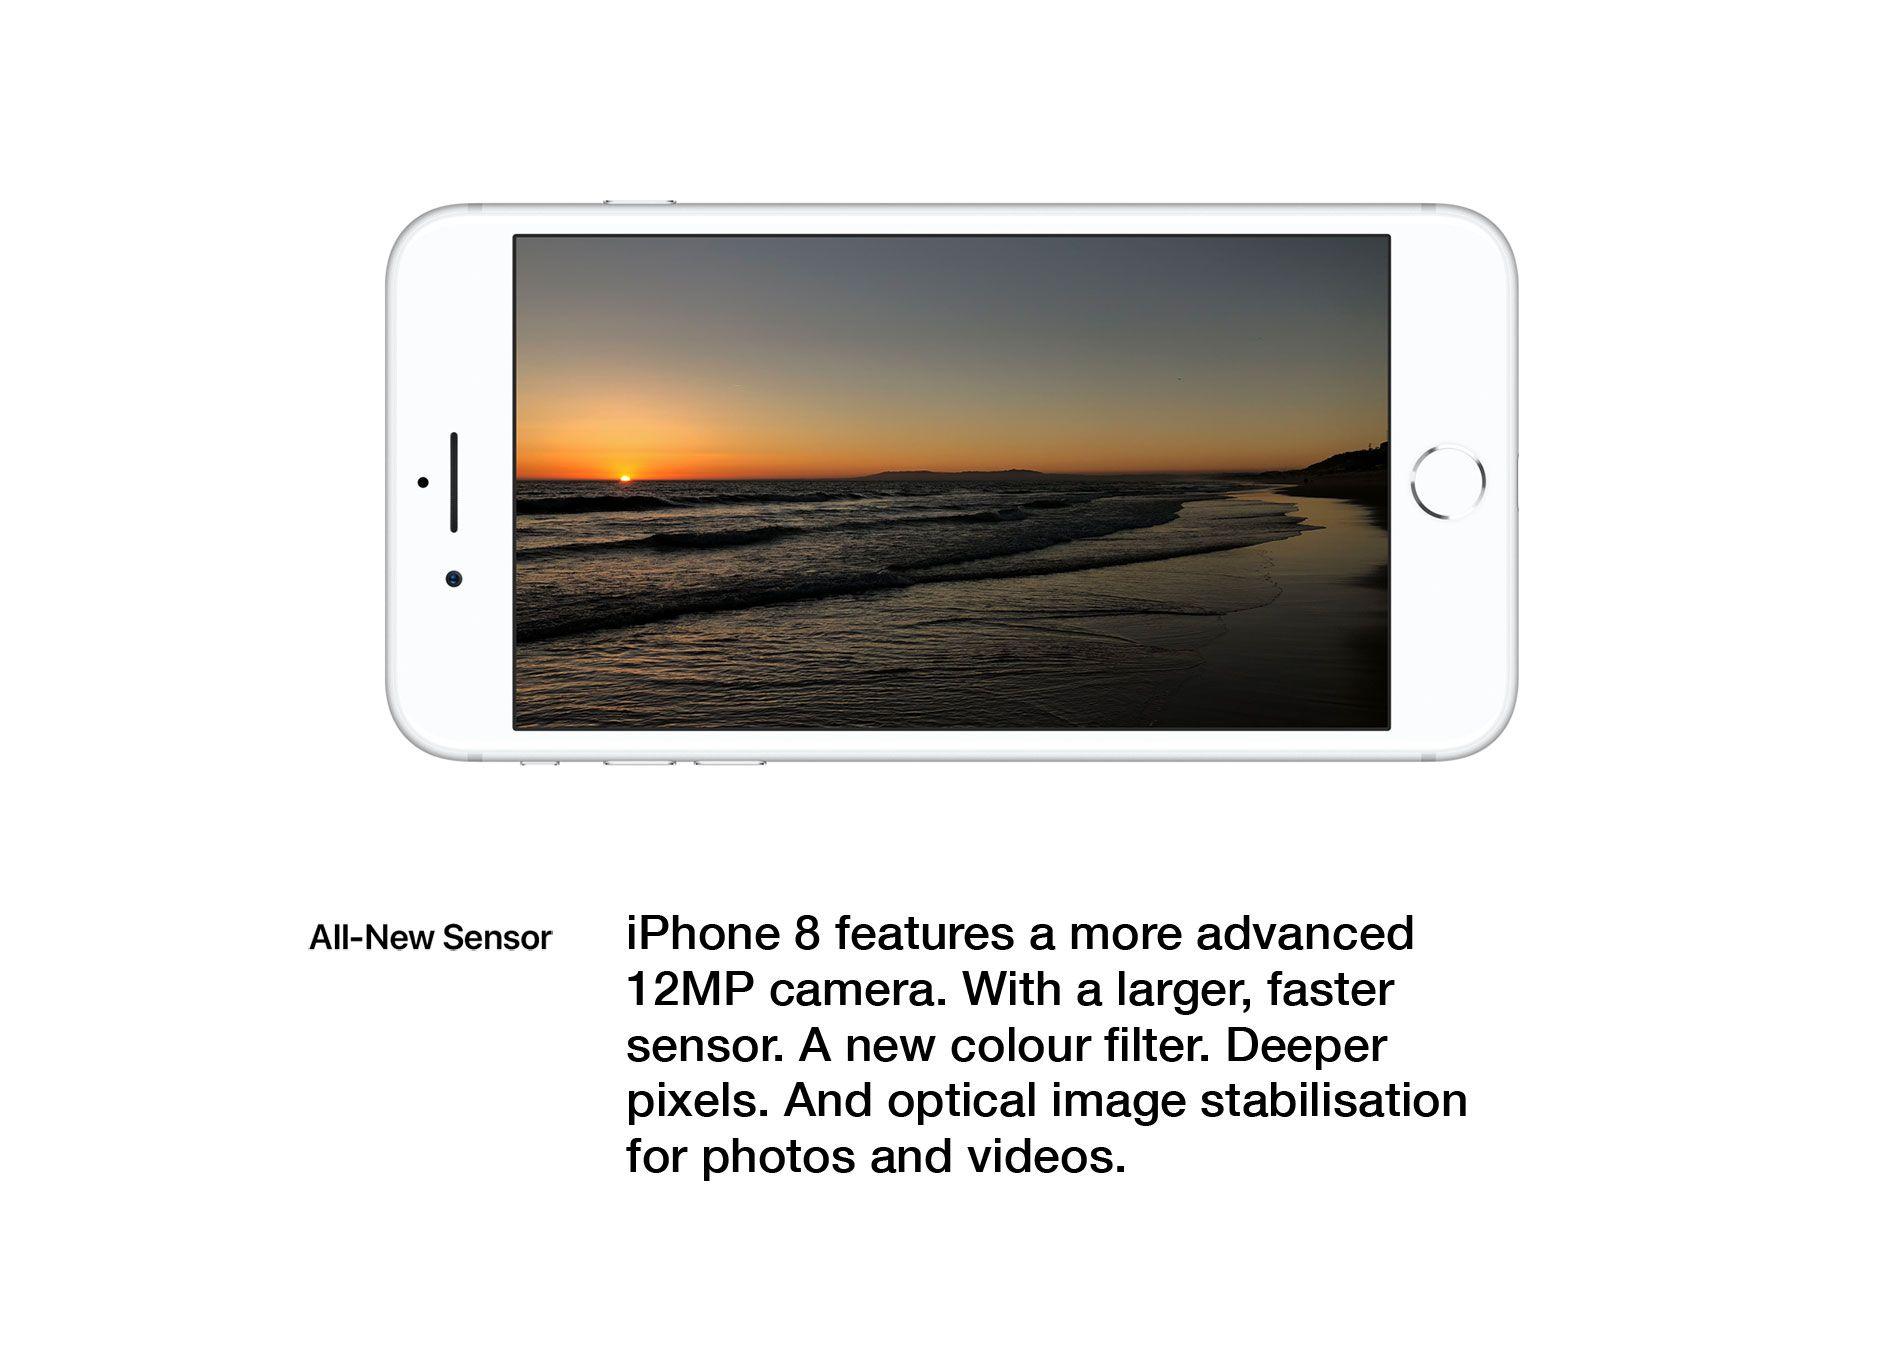 All-New Sensor